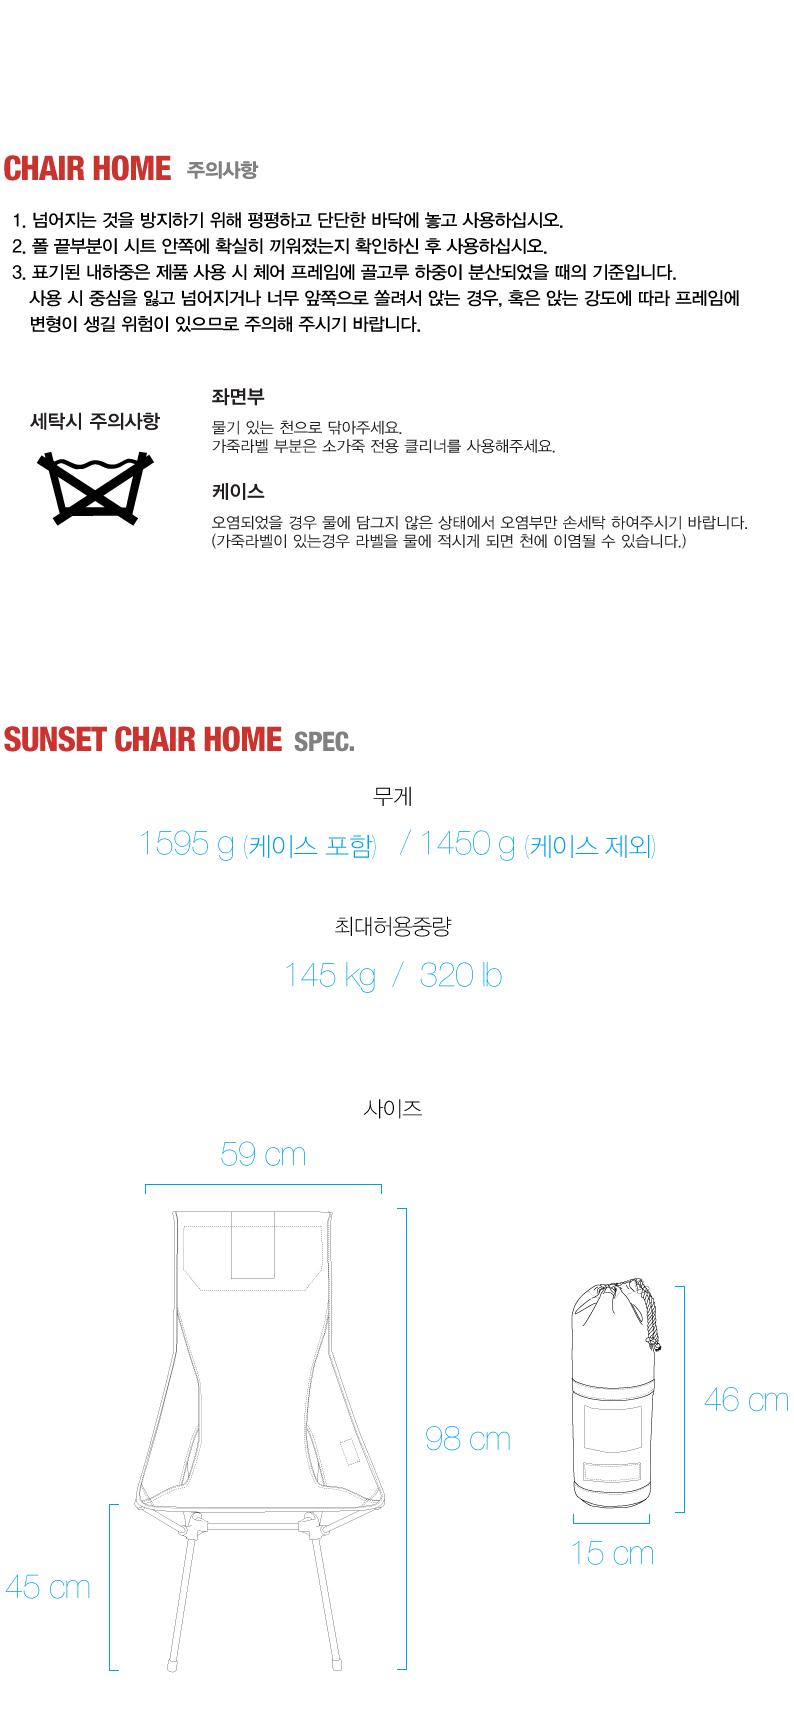 20170102-Helinox-Sunset-Chair-Home-spec.jpg